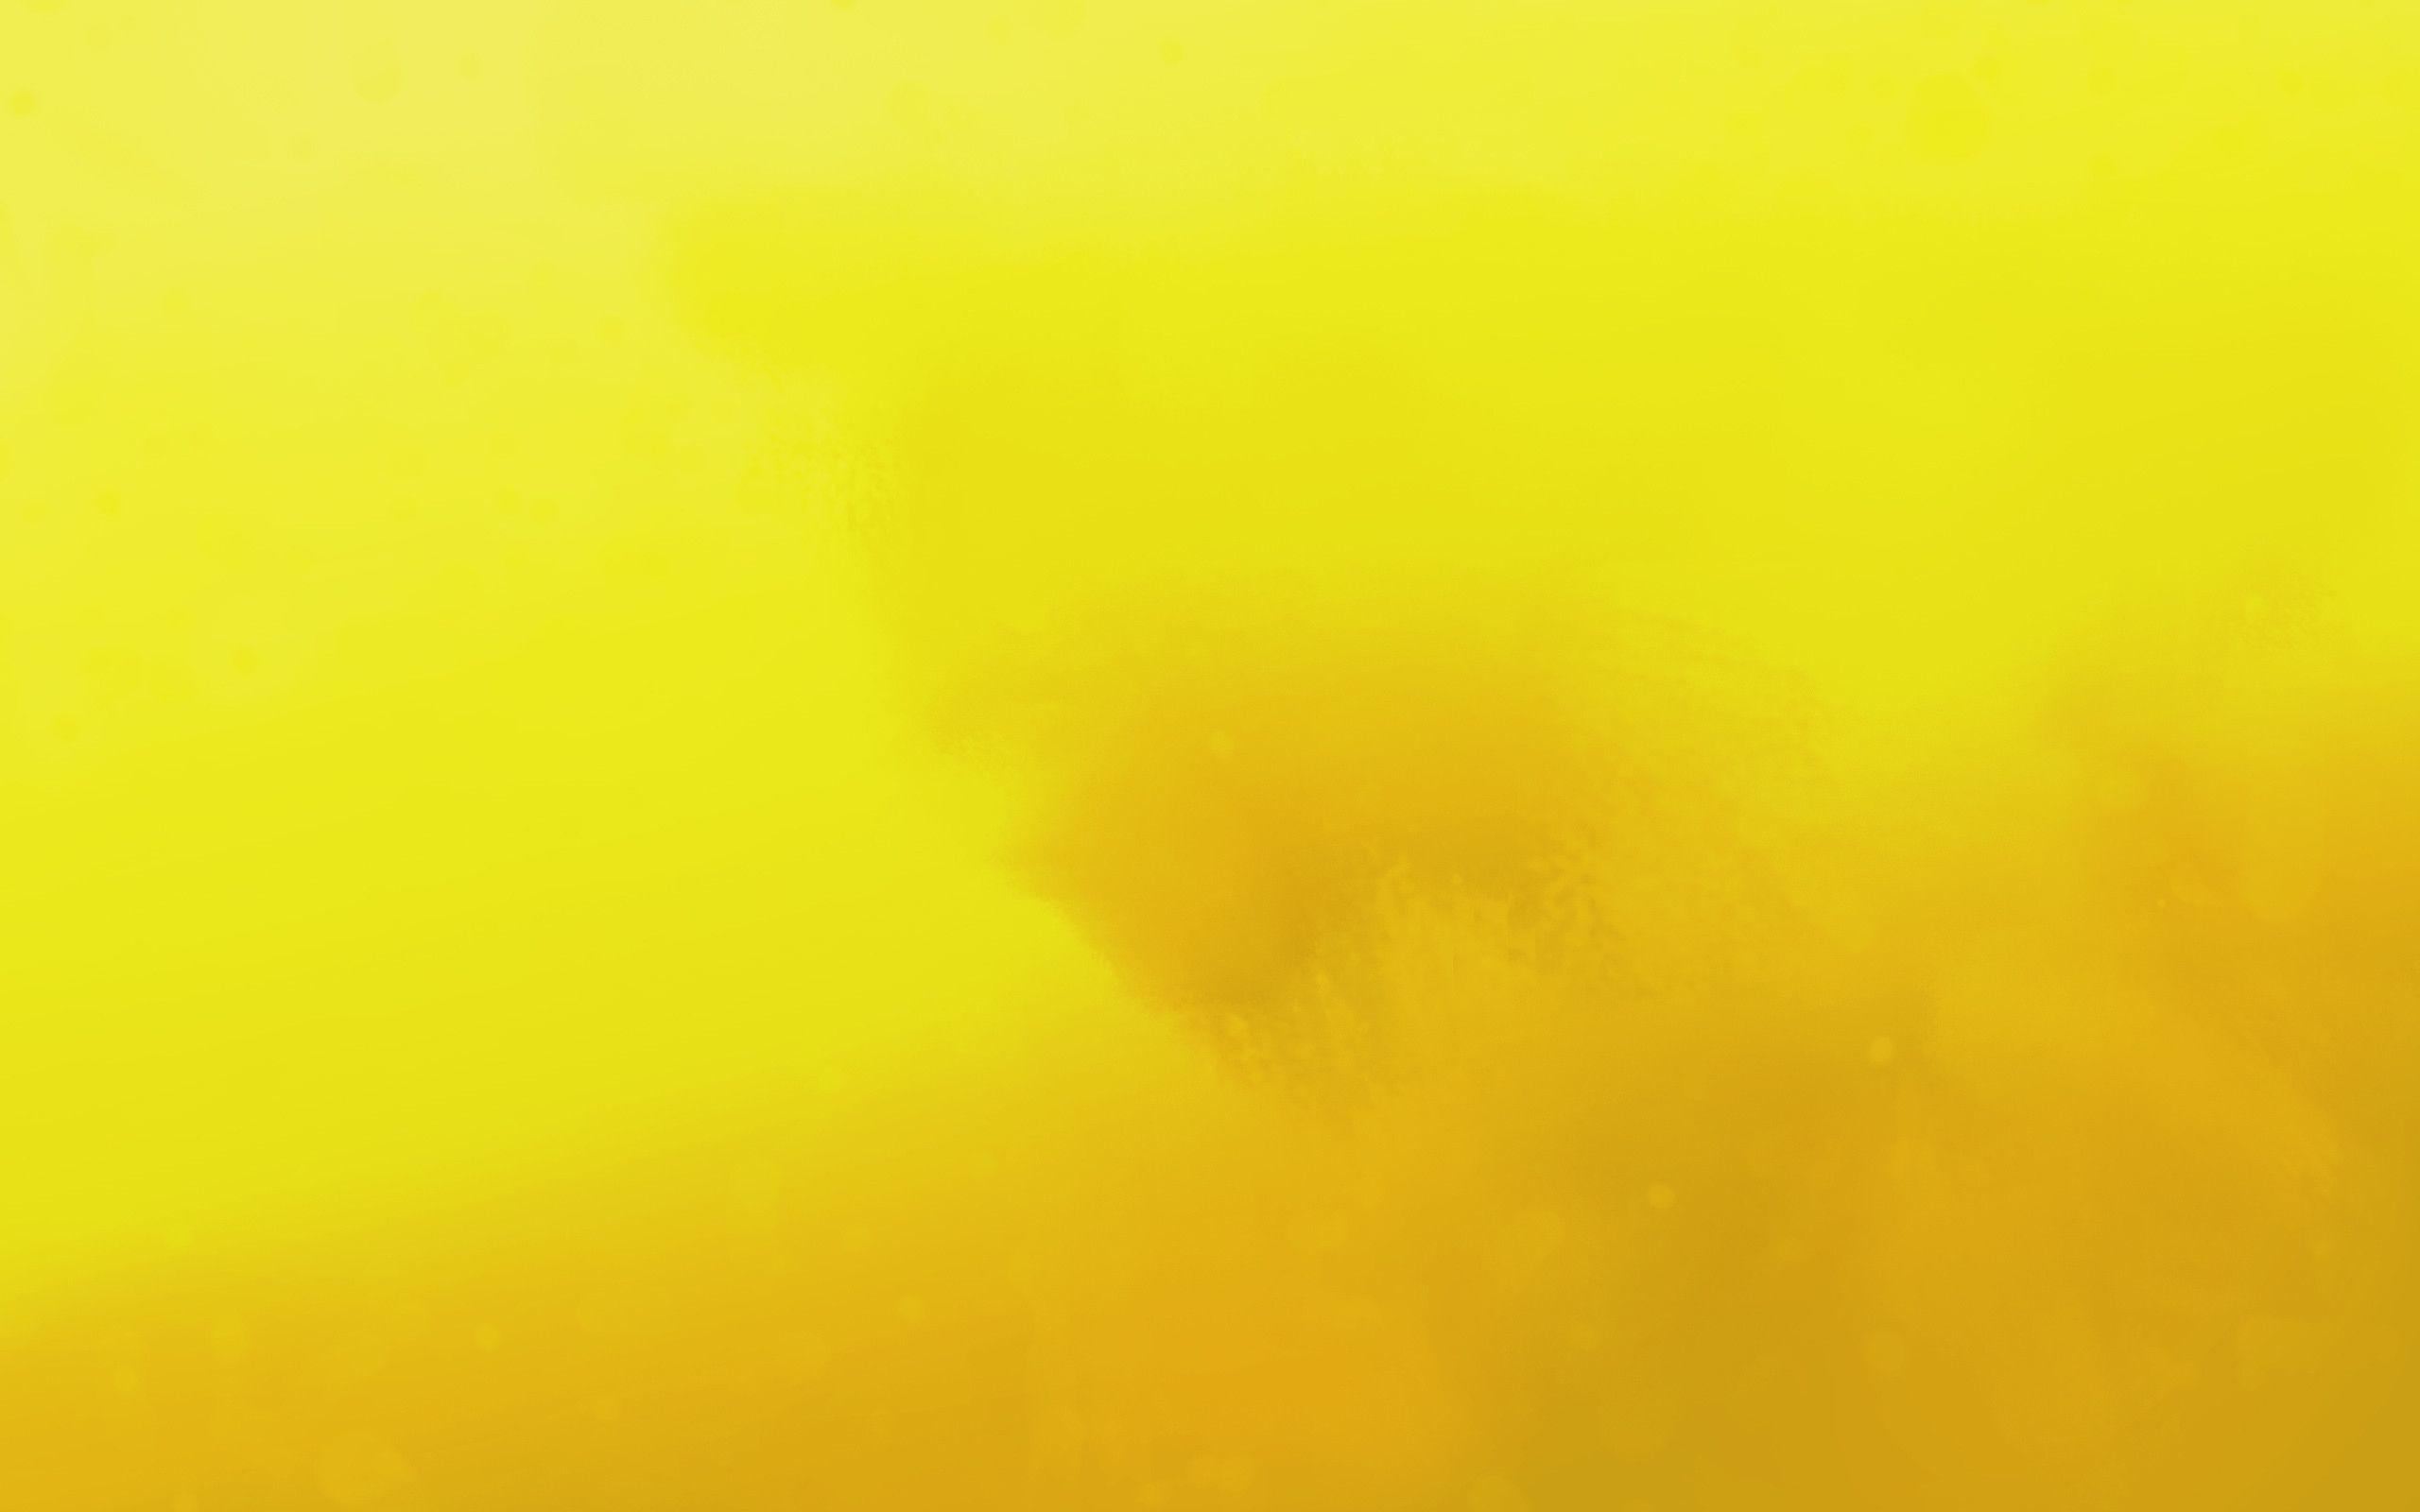 … Yellow Wallpaper (19) …